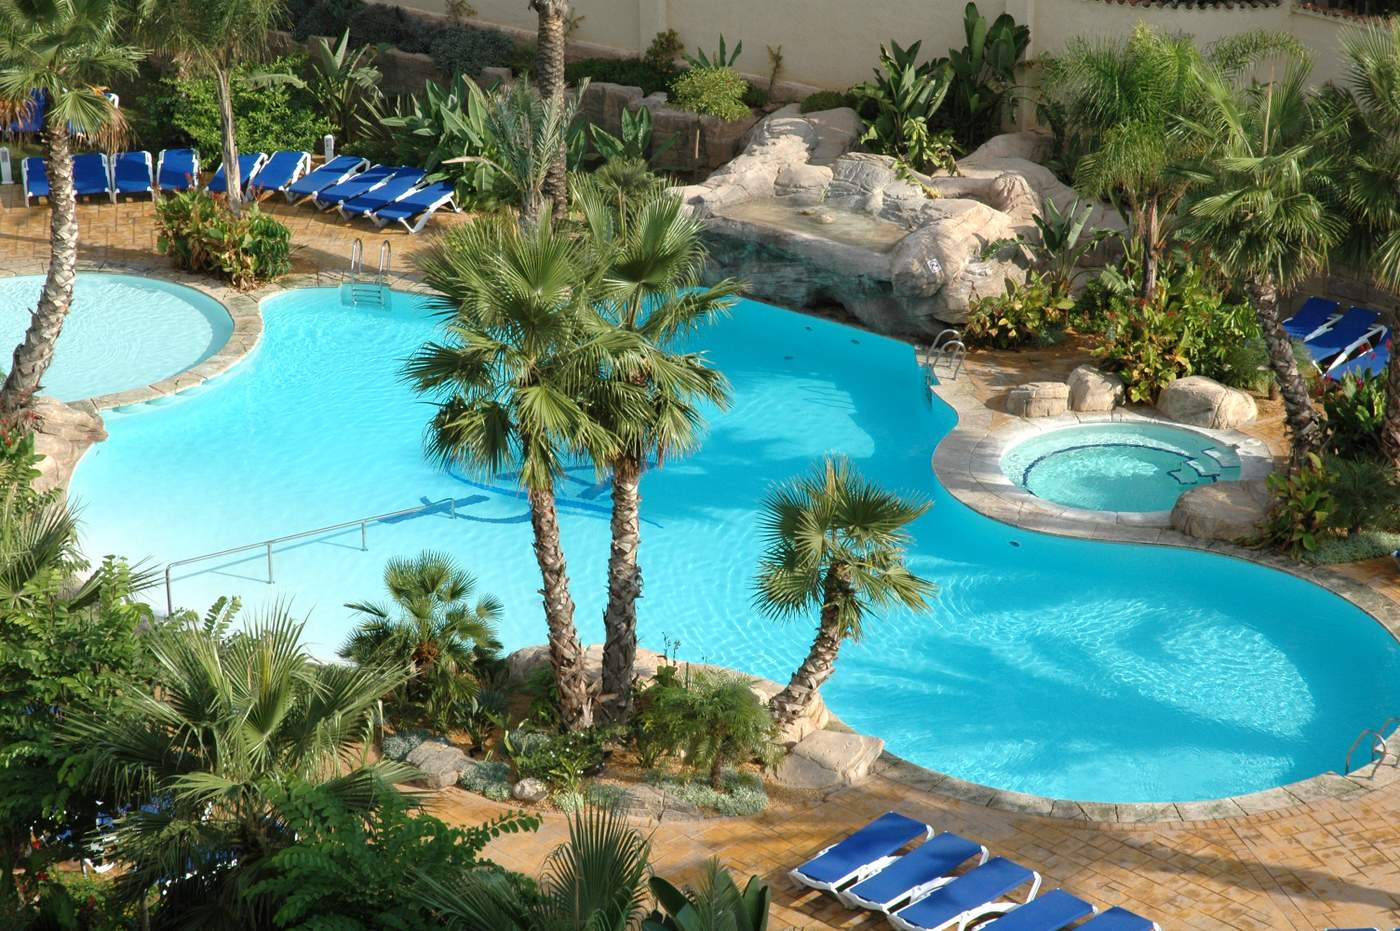 The 4 star Albir Playa swimming pool